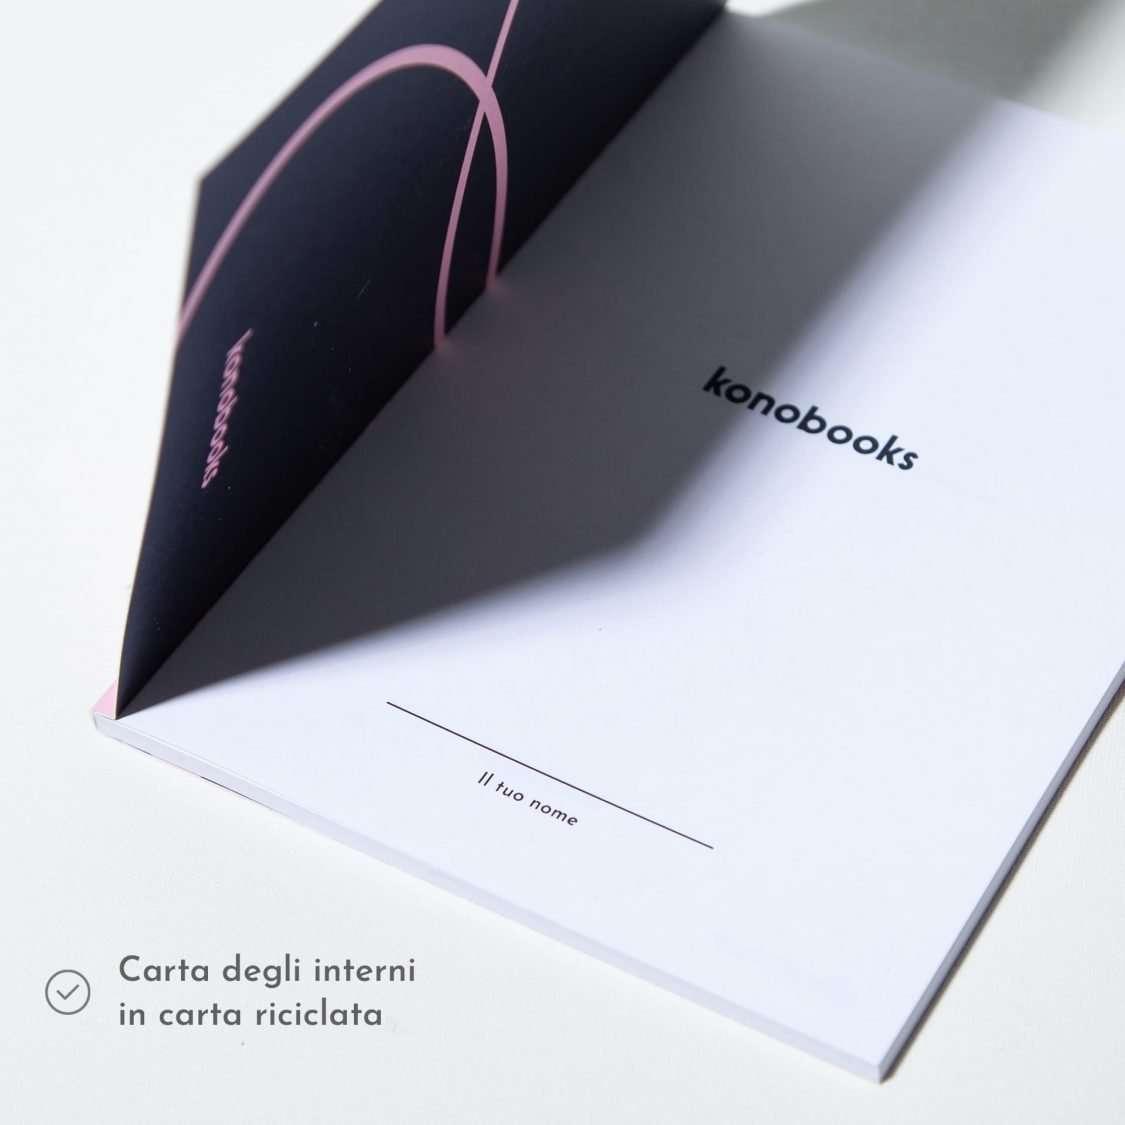 Quaderno in carta riciclata - Quaderni ecologici Konobooks